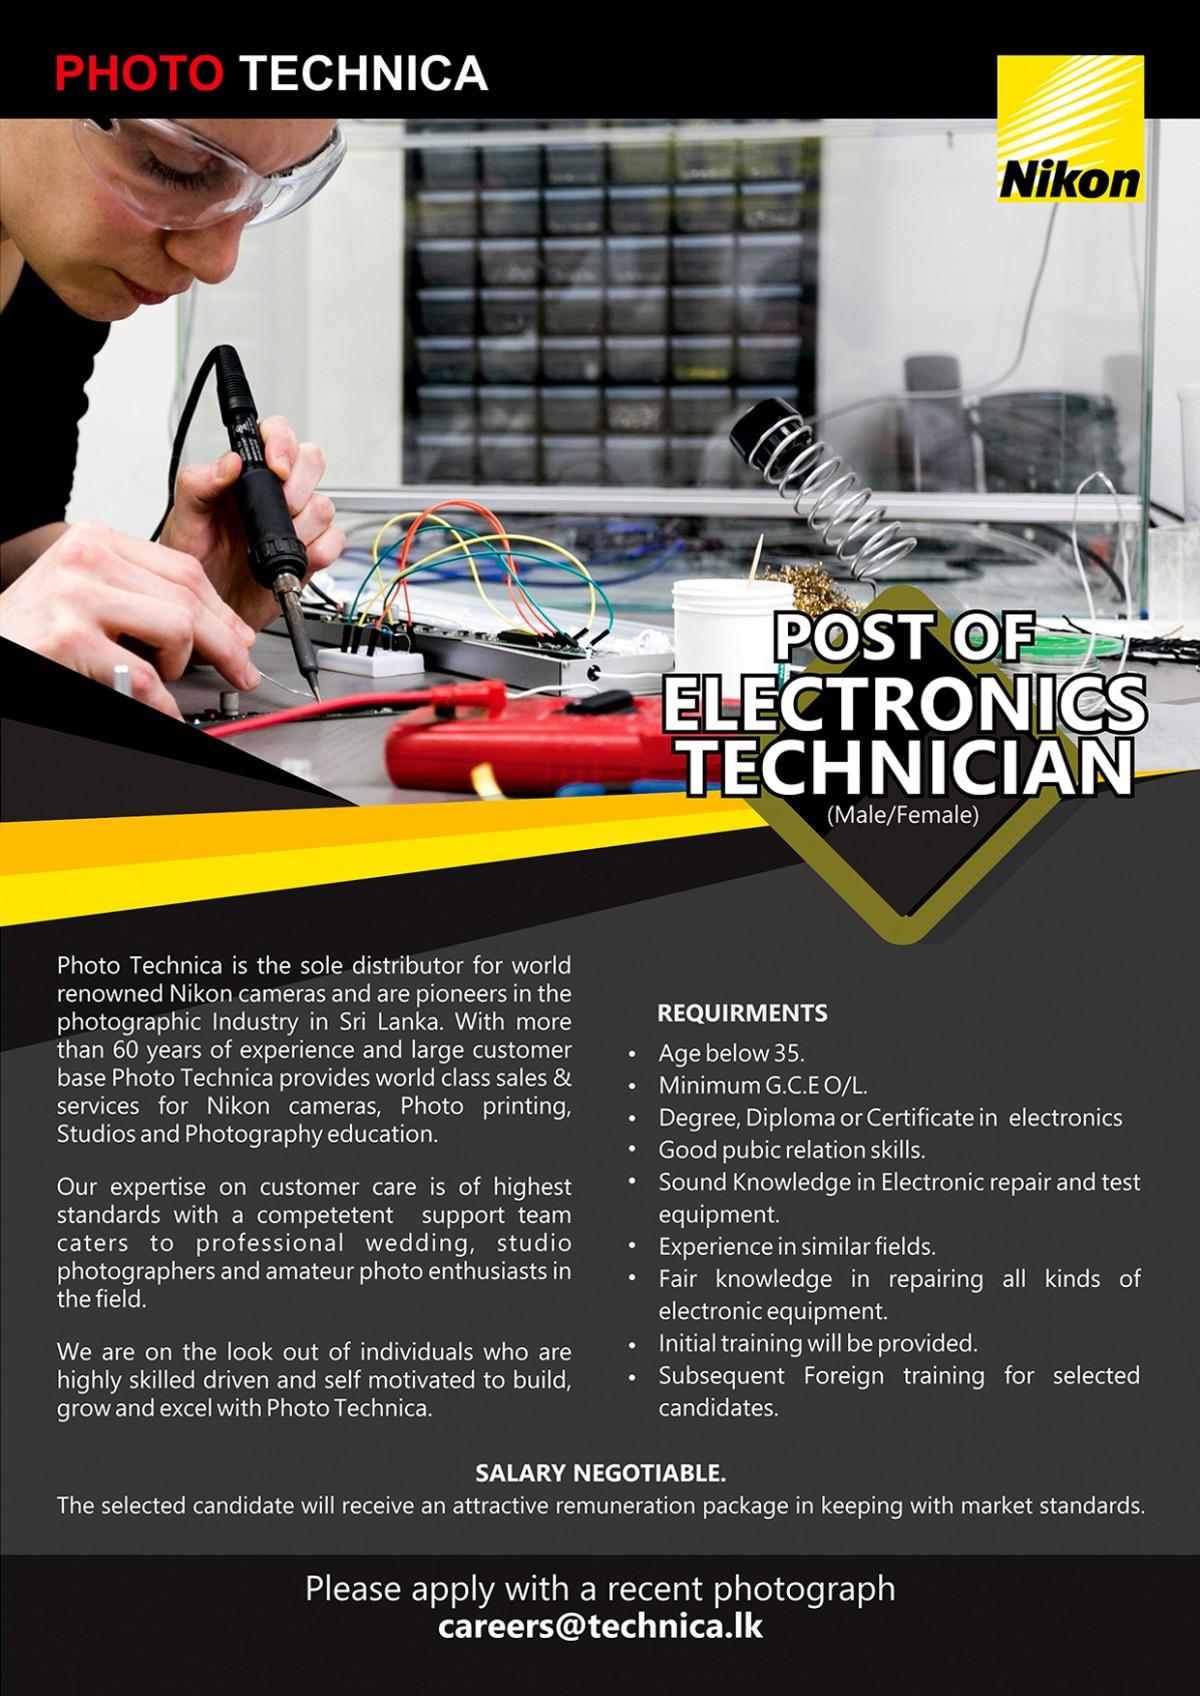 ELECTRONICS TECHNICIAN 2020